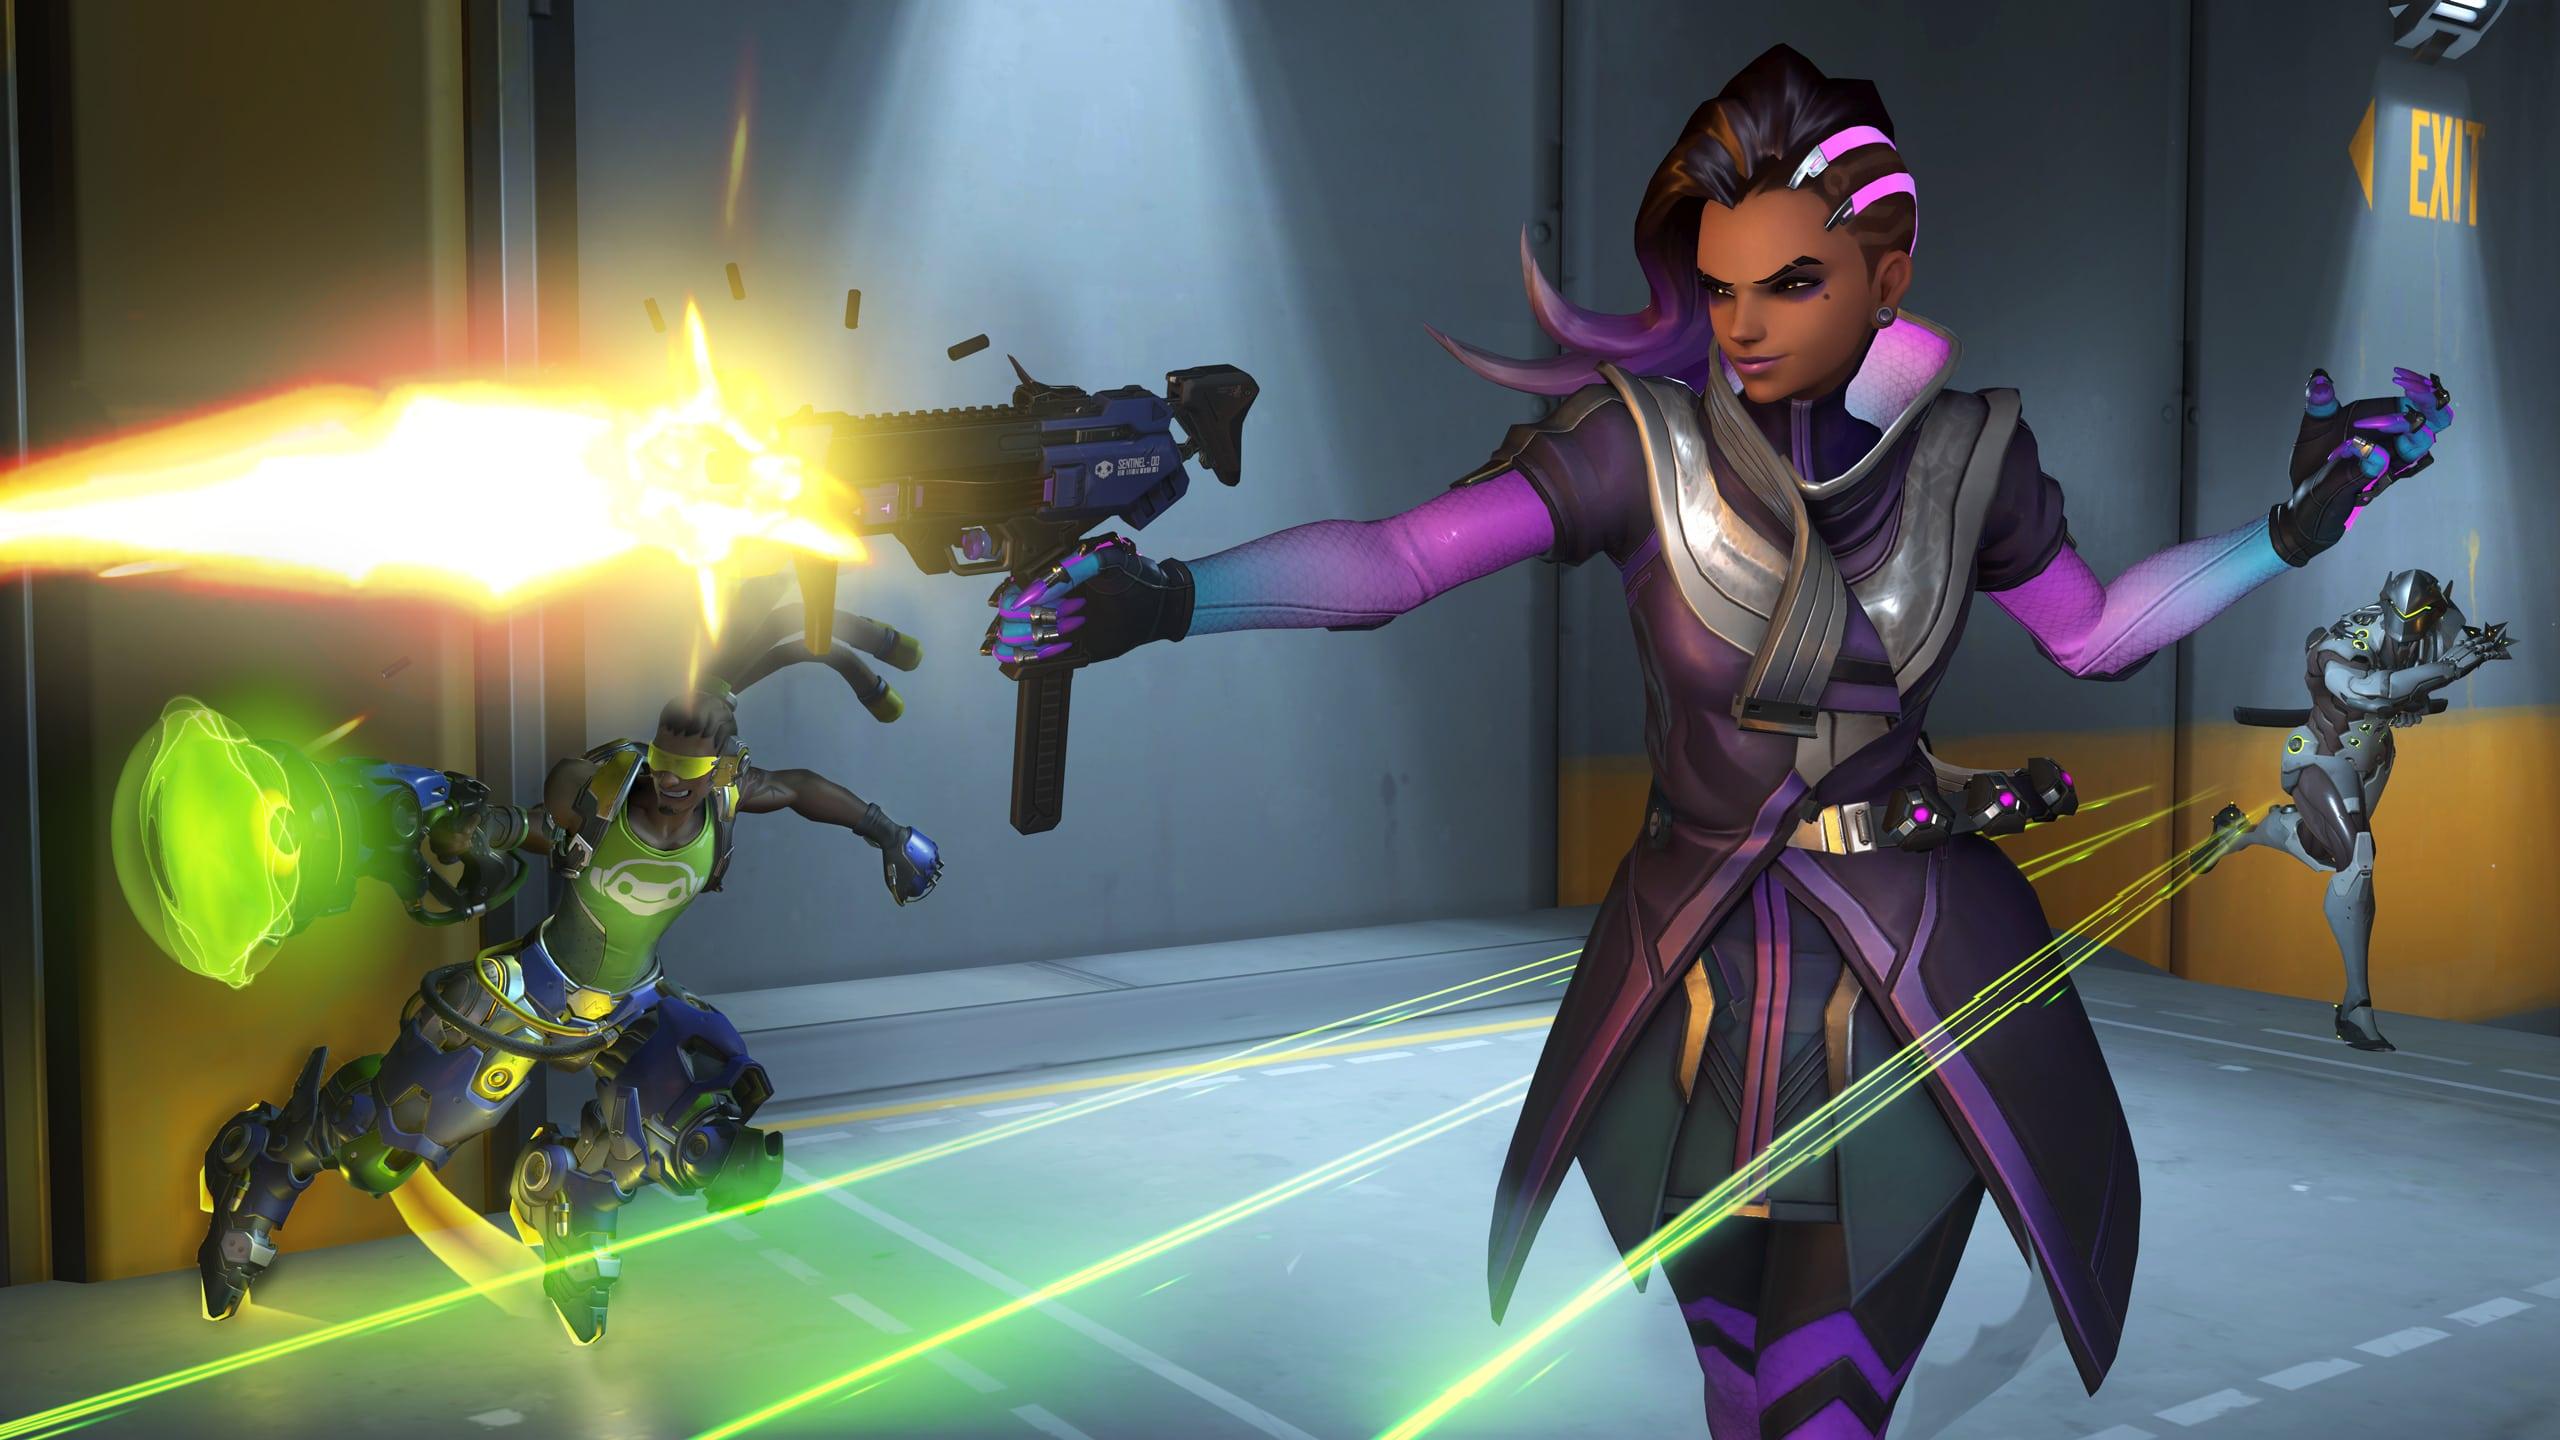 sombra-screenshot-002-fb6b4eea3c8822bf196065adc23a2e5f18d2b67a6ae3a91230e3e86e328f0956bc0c753996cd60e14011acde89eb0a981c8cda3884d084132b40a76d42320d0a-1